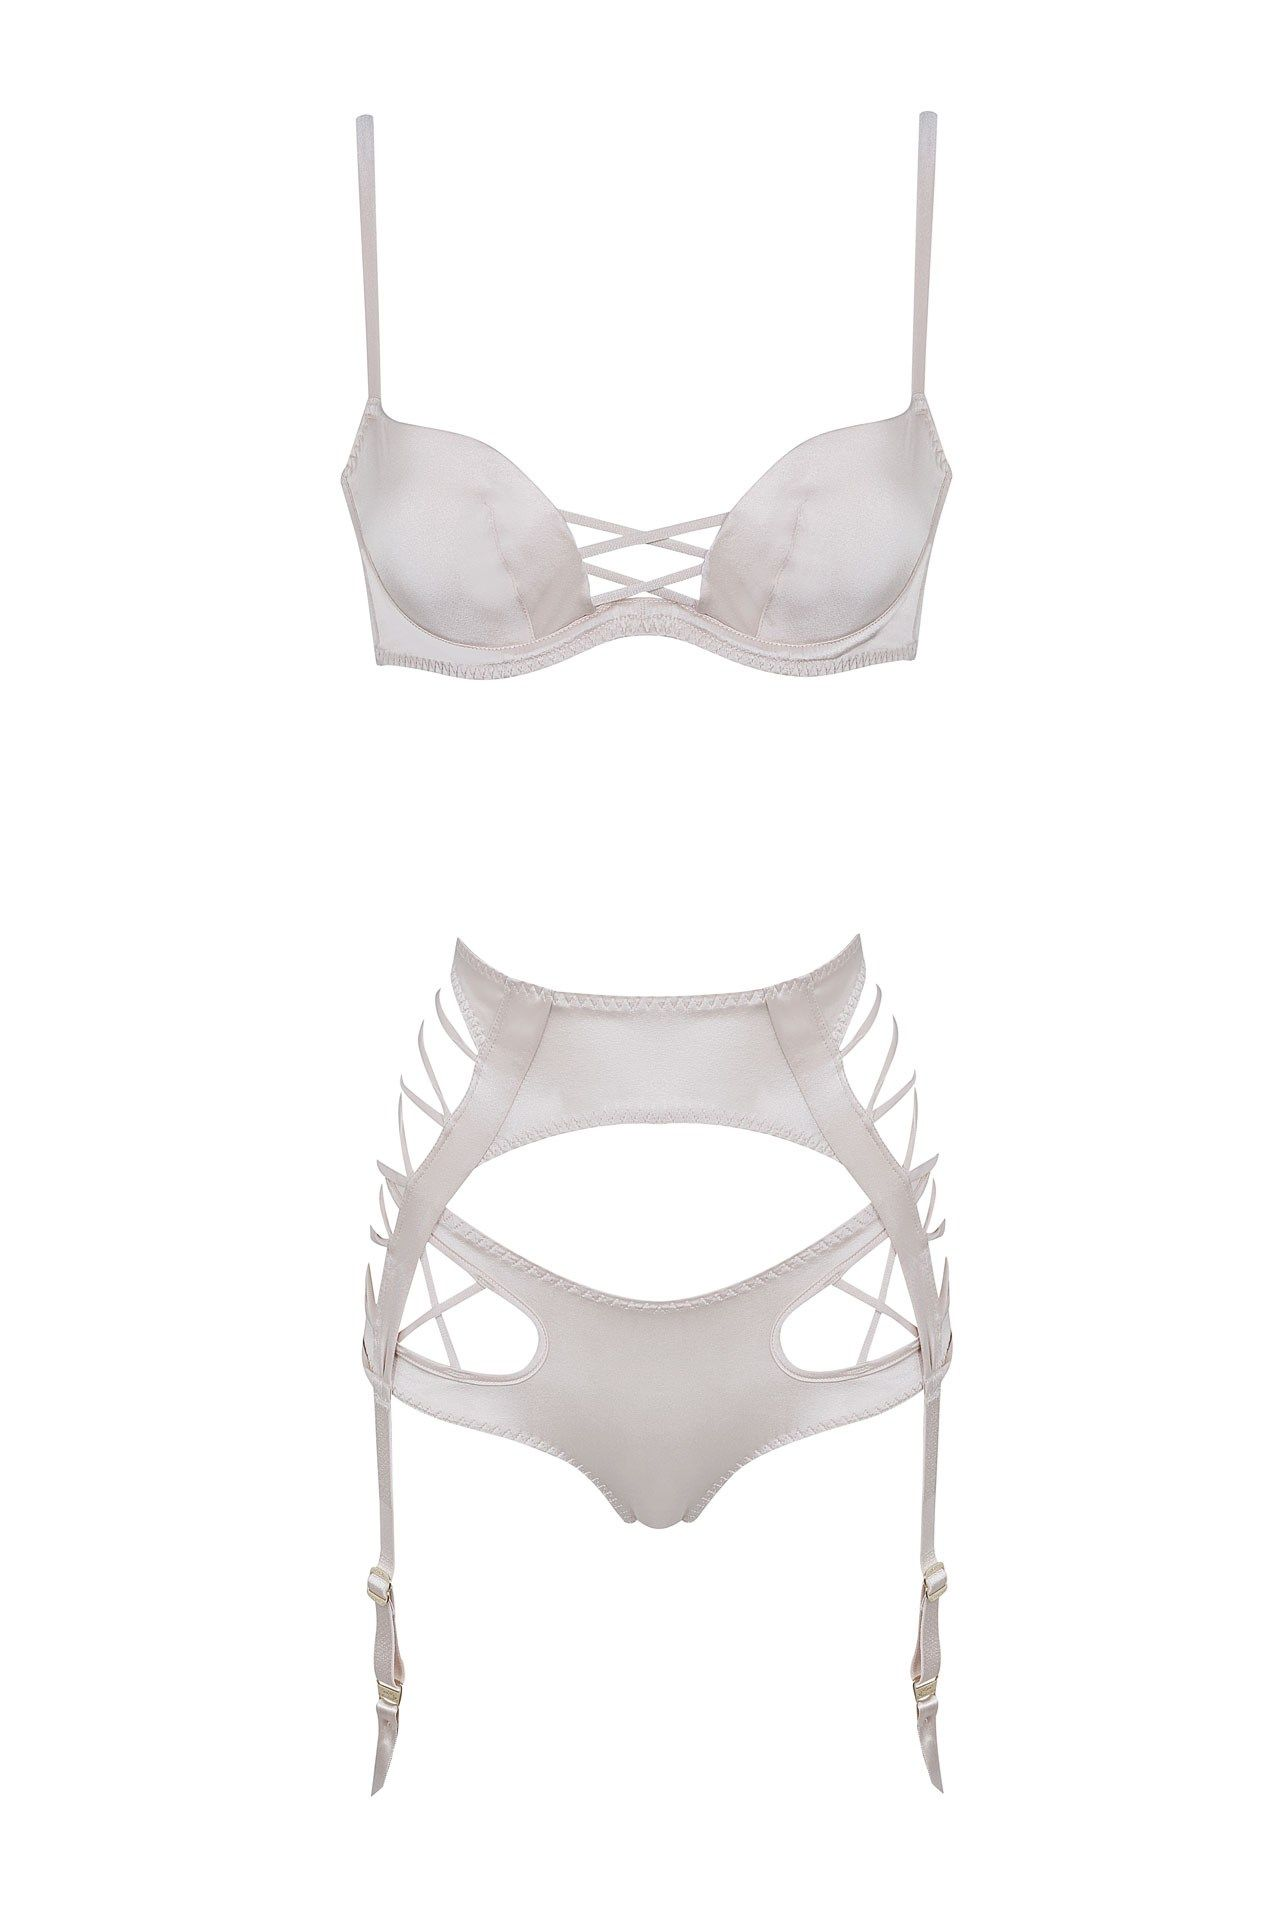 Bra for wedding dress shopping  Zsi Zsi set  White  Pinterest  Lingerie Swimming and Shopping lists